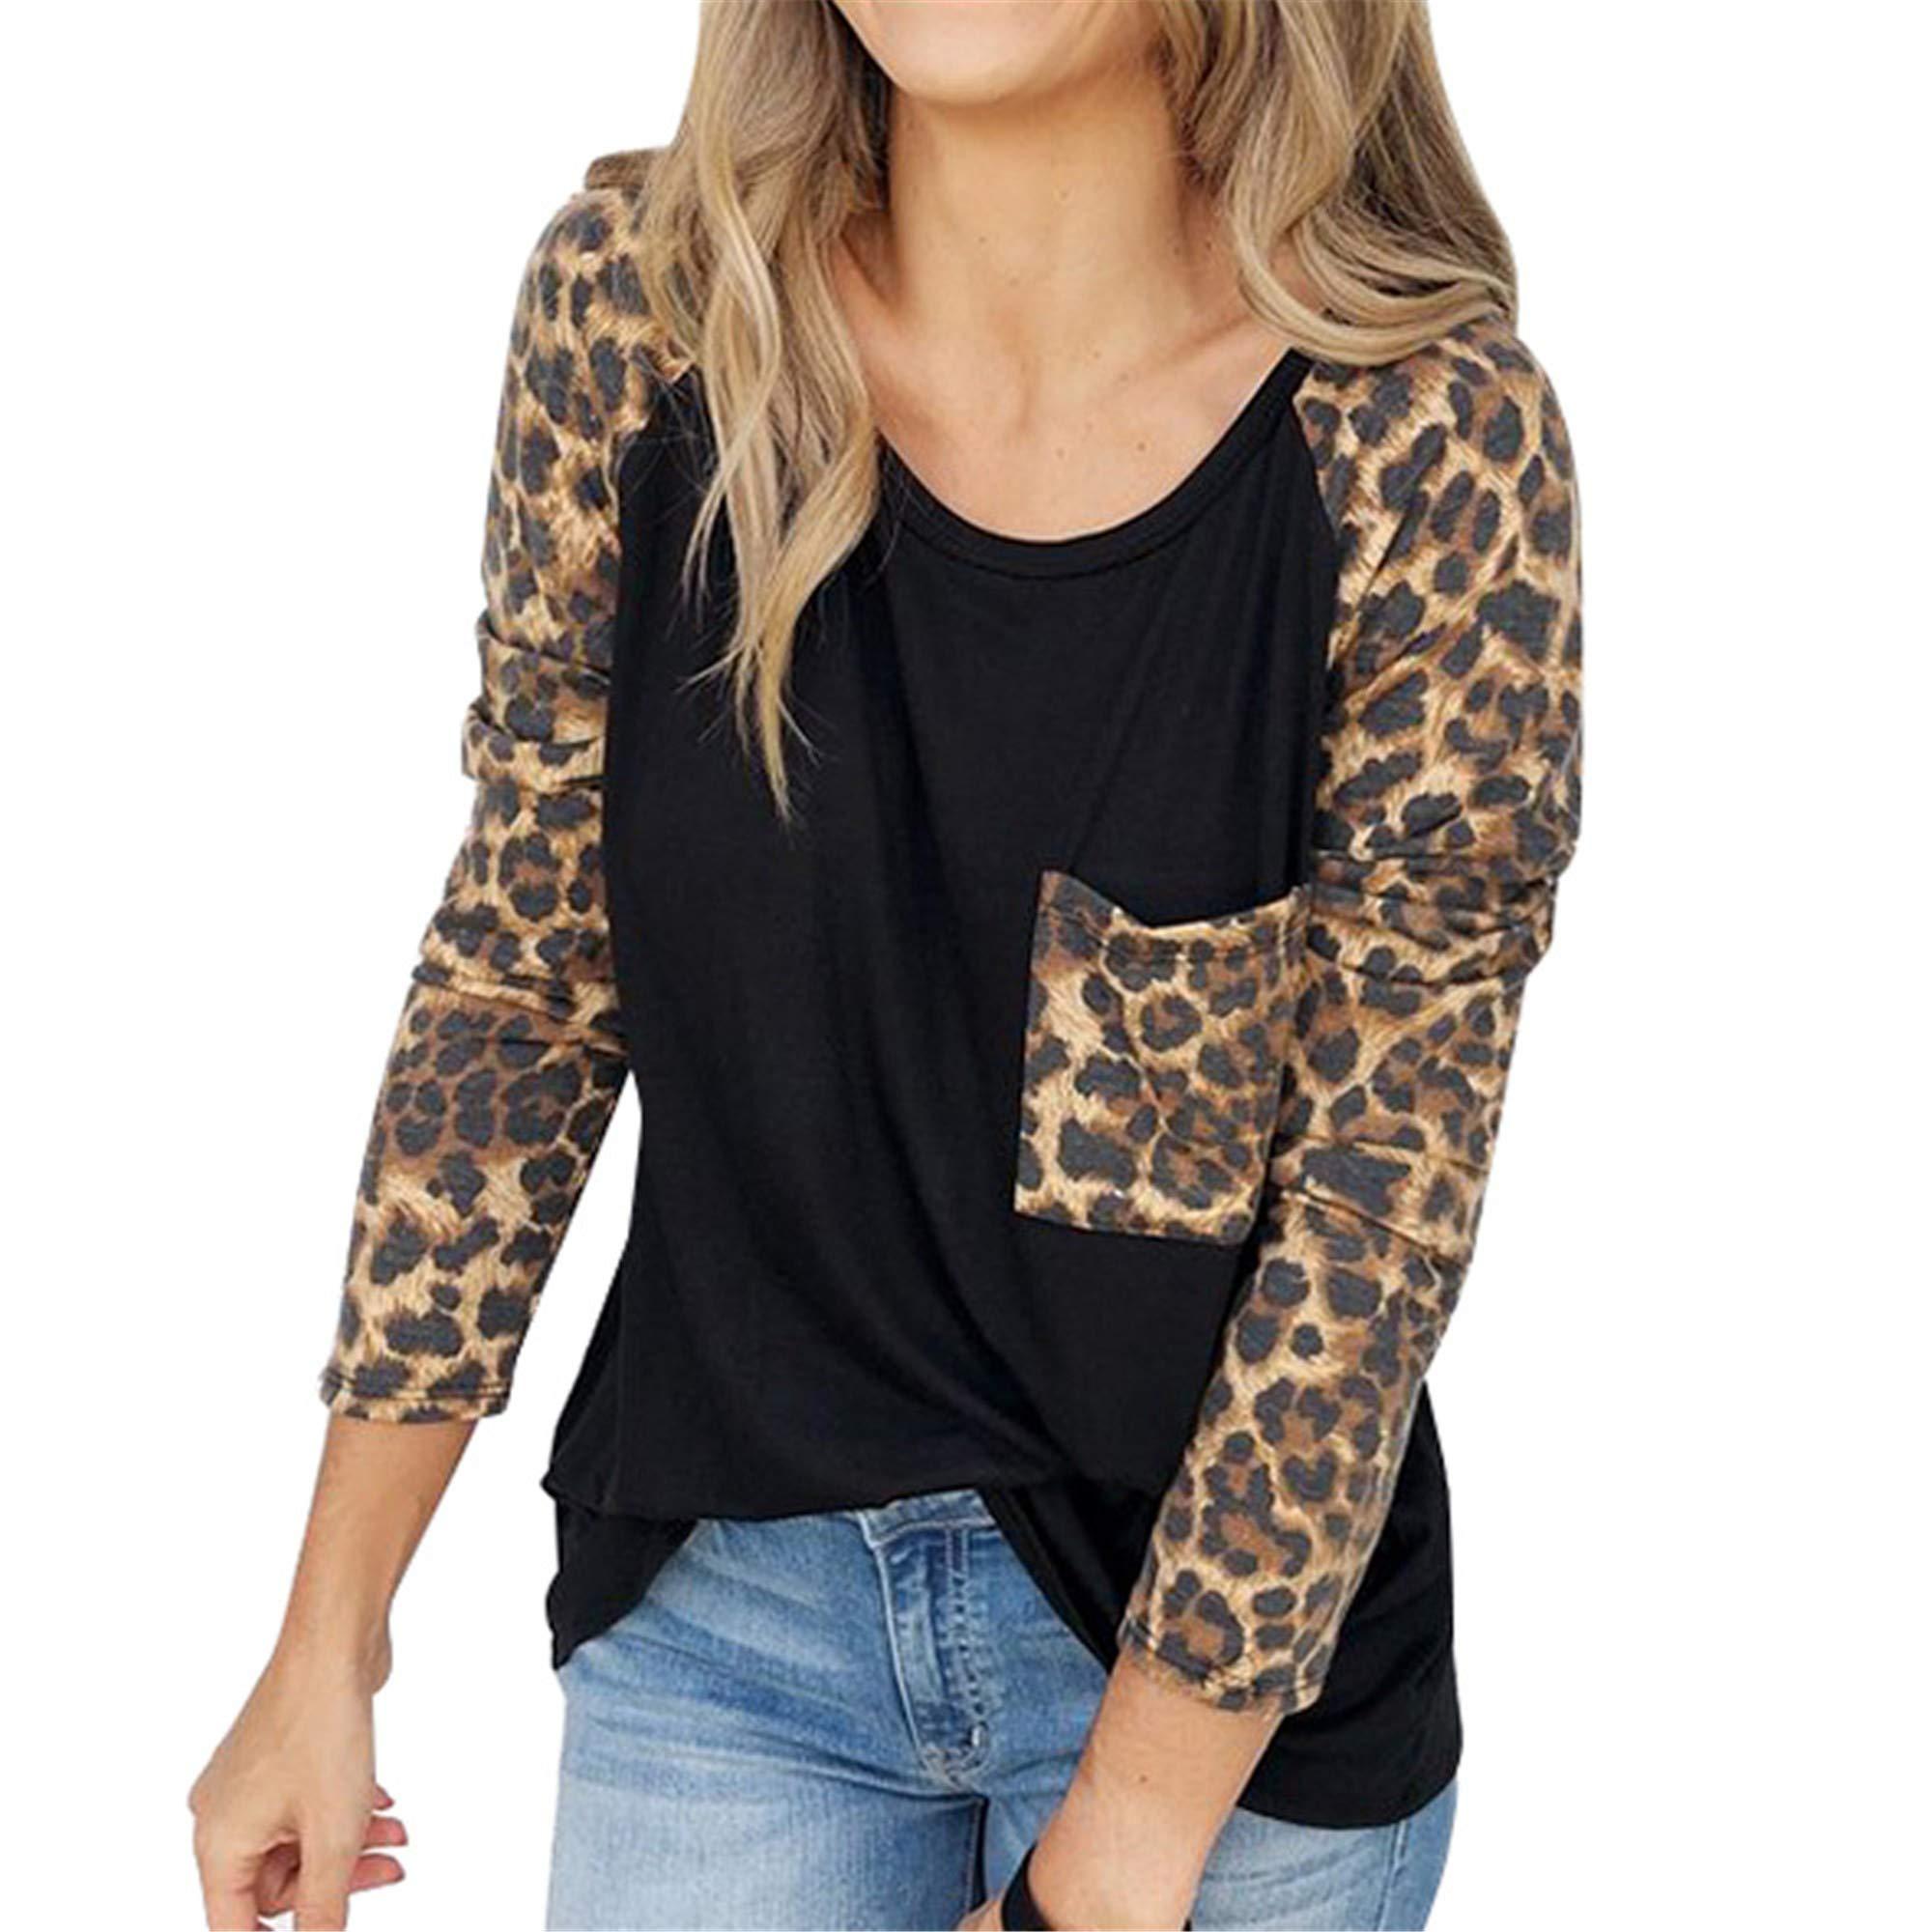 SMALLE ◕‿◕ Fashion in Women's Sweatshirt Leopard Printed Blouse Ladies Drop Shoulder T-Shirt Tops Shirt